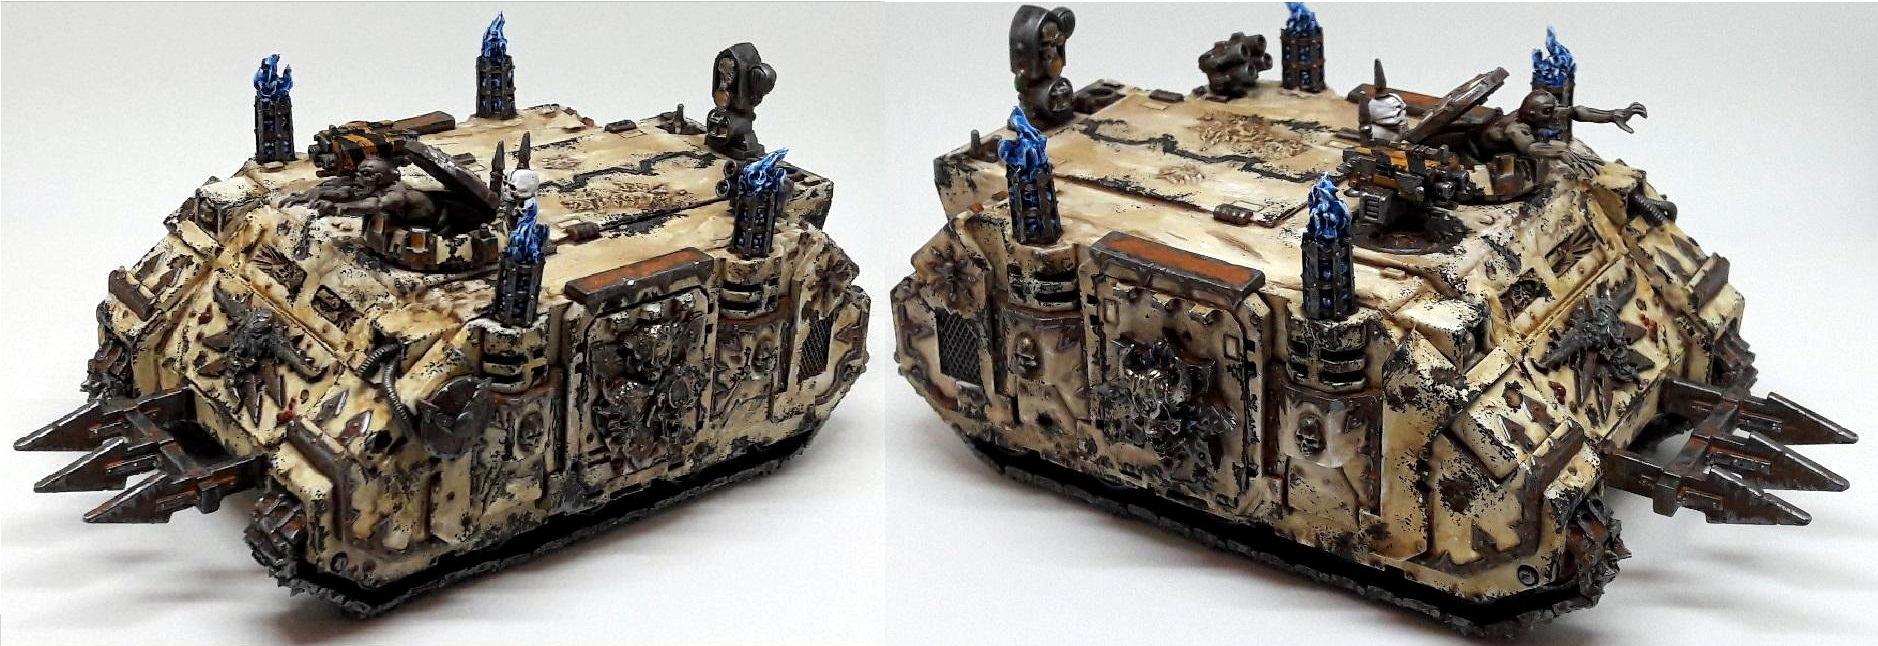 Chaos Space Marines, Conversion, Death Guard, Nurgle, Rhino